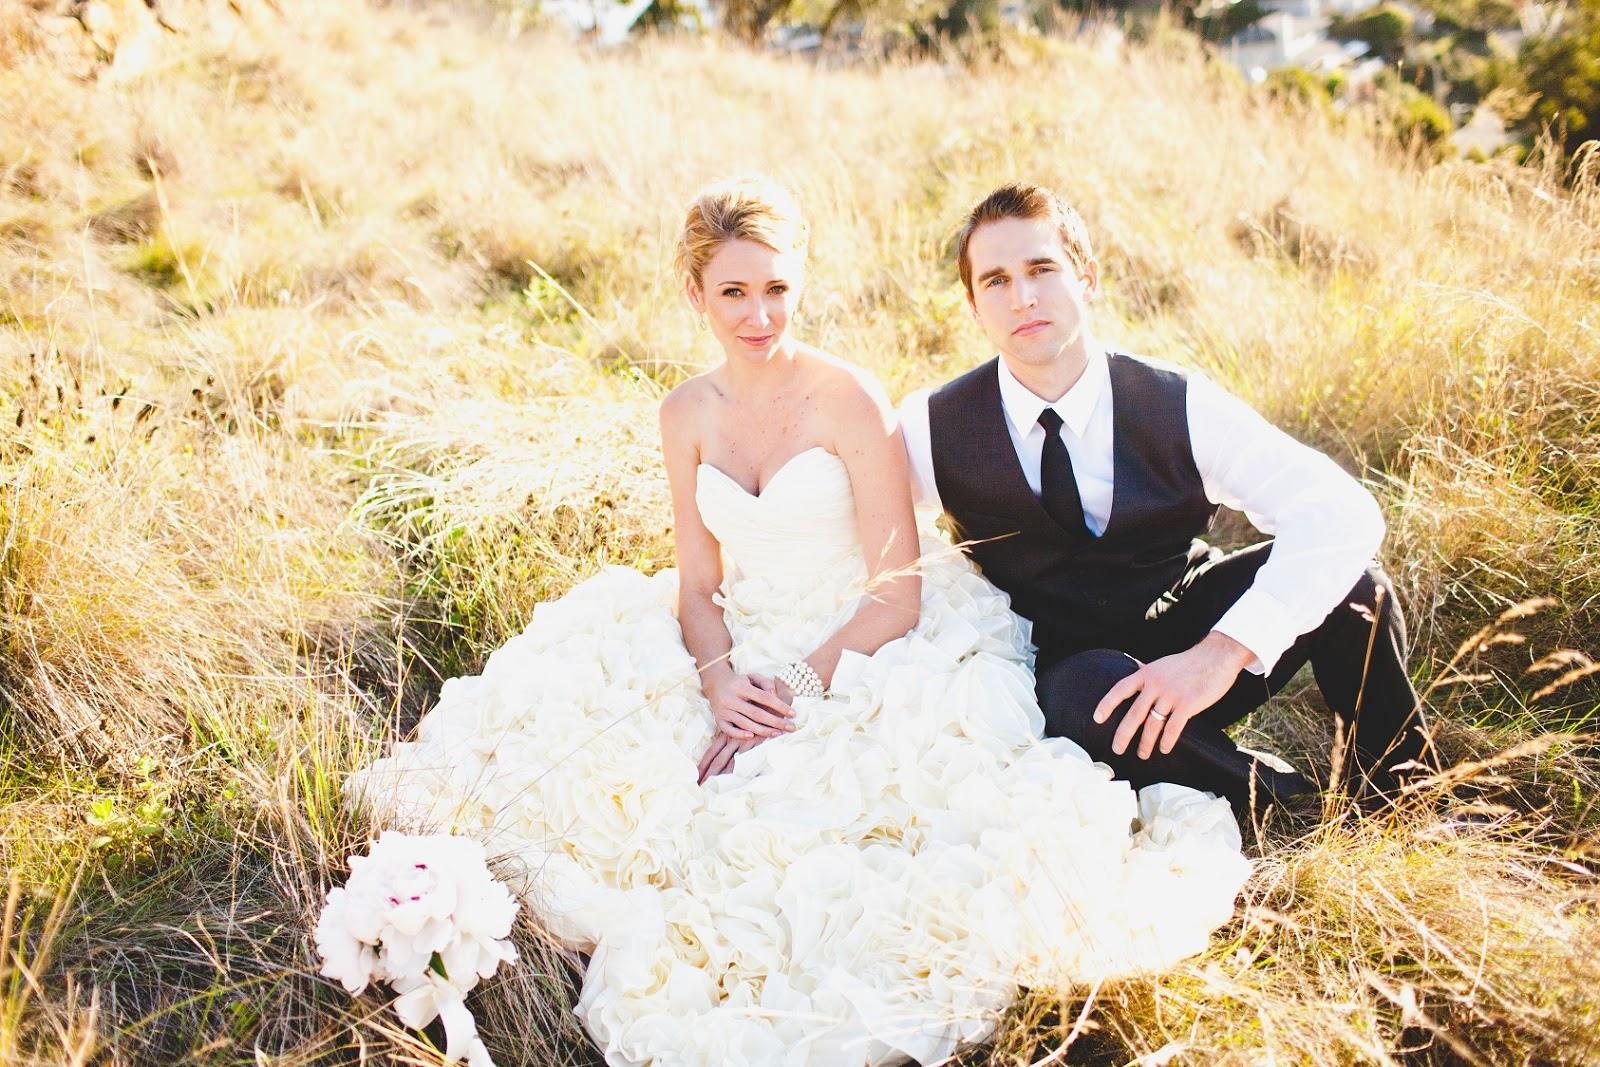 Erin Coleman Sunday Rose Wedding Dress Replica Real Bride Megan